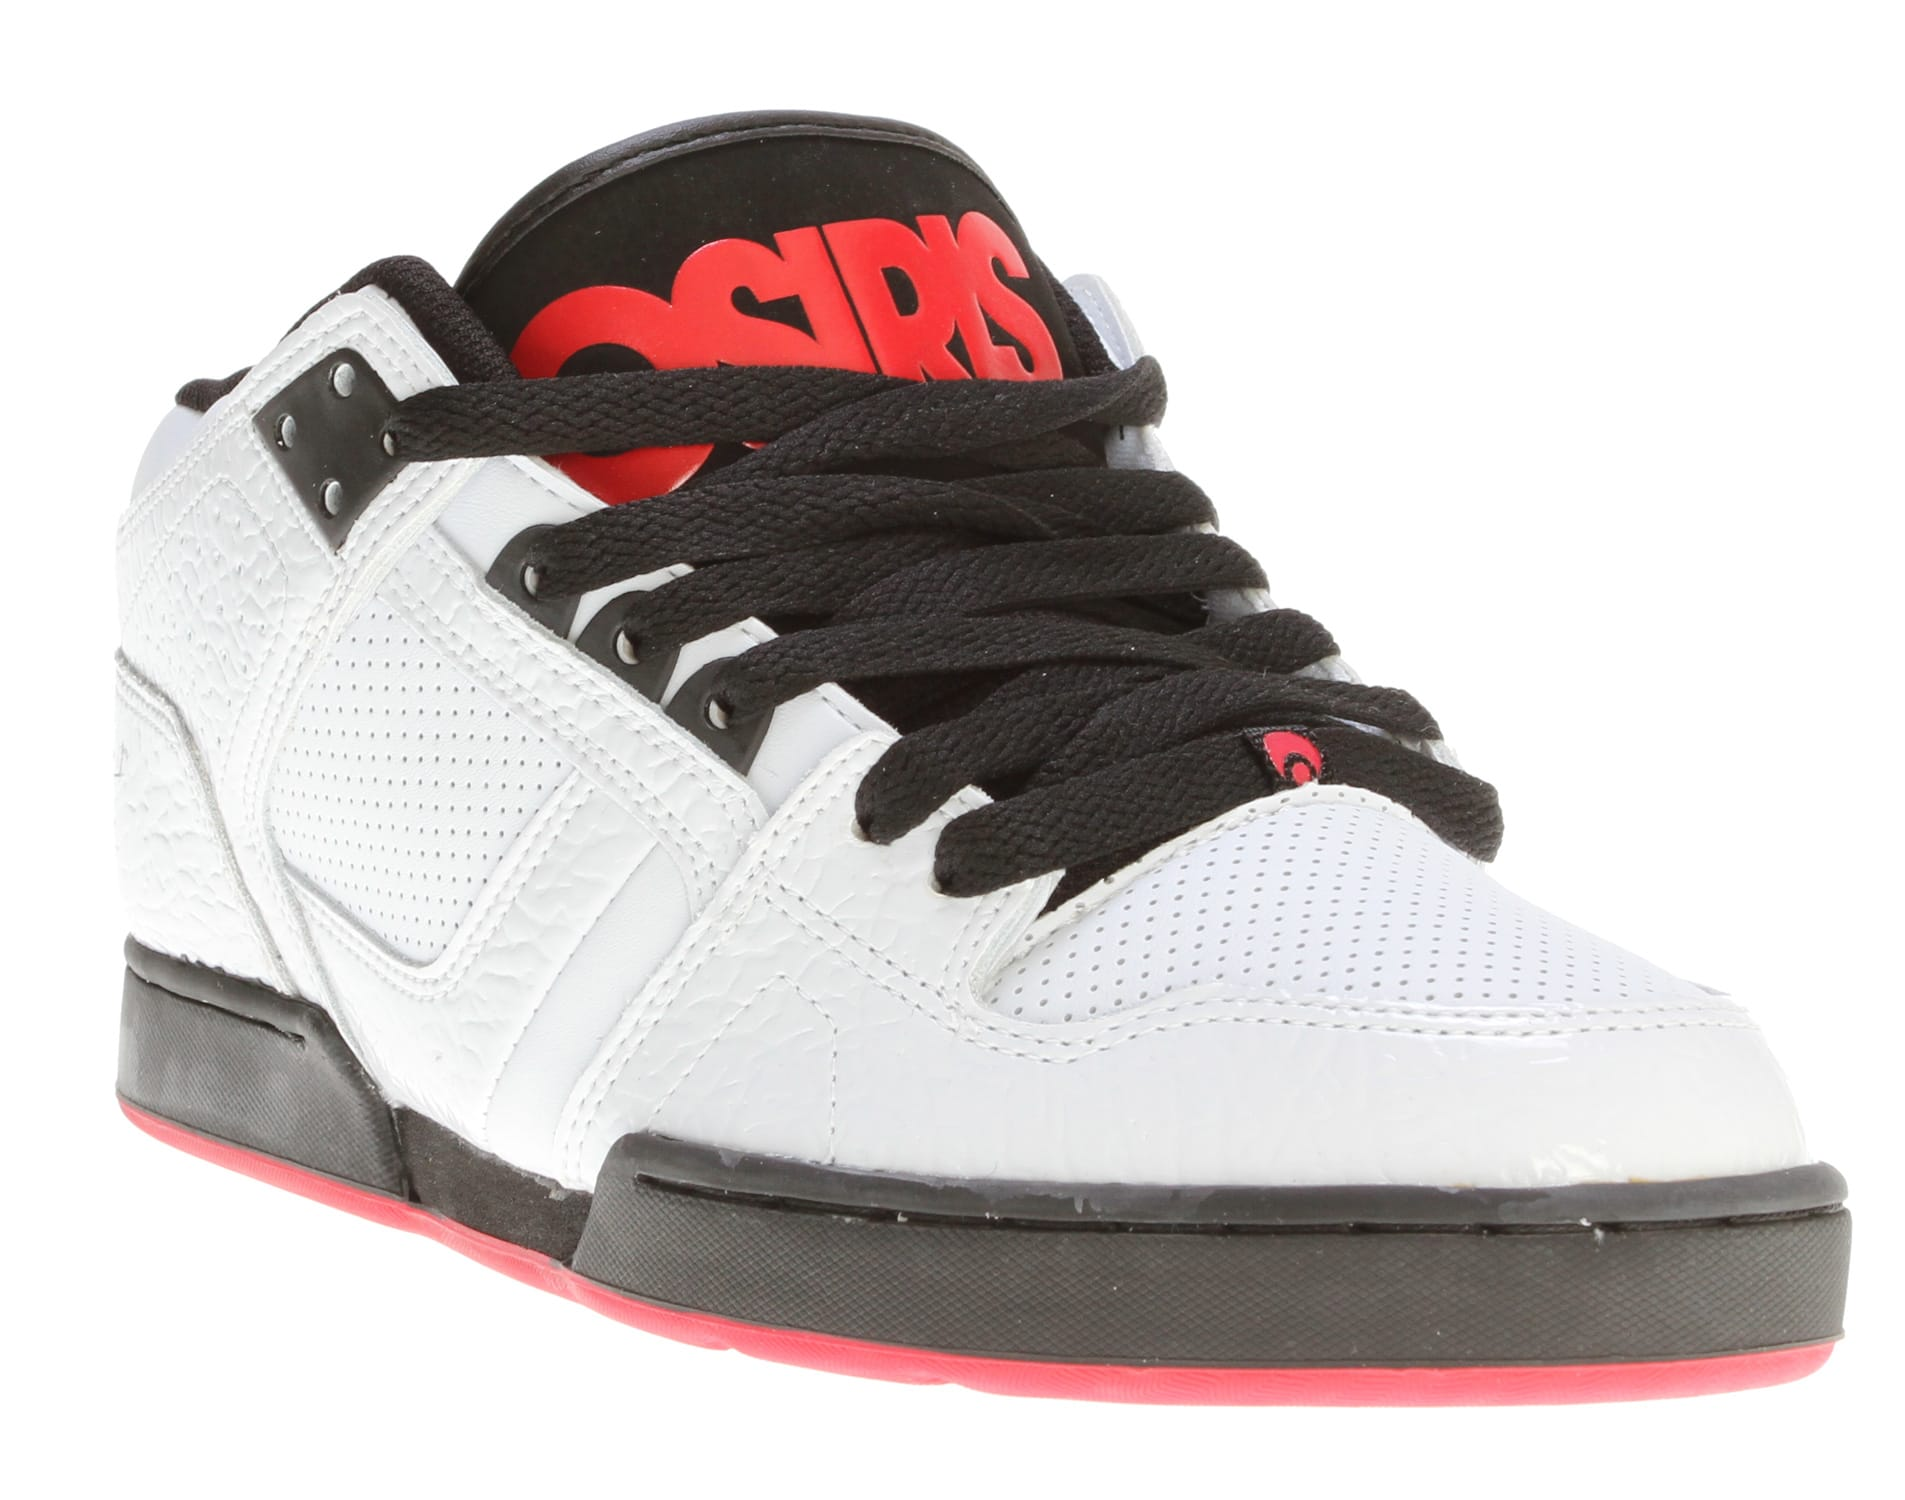 c5aff084e6a Osiris NYC 83 Mid Skate Shoes - thumbnail 2